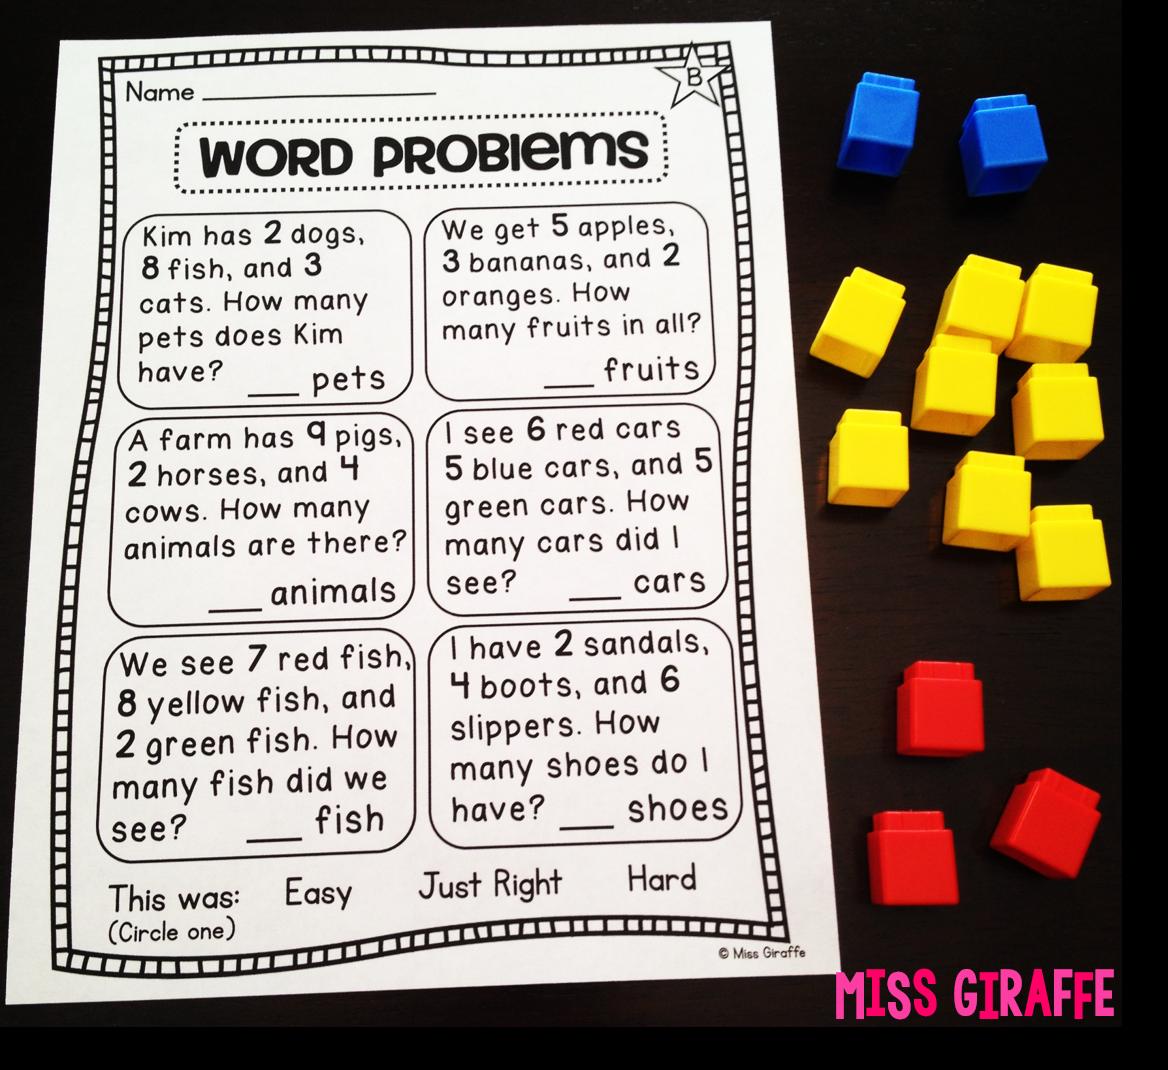 Miss Giraffeu0026#39;s Class: Adding 3 Numbers